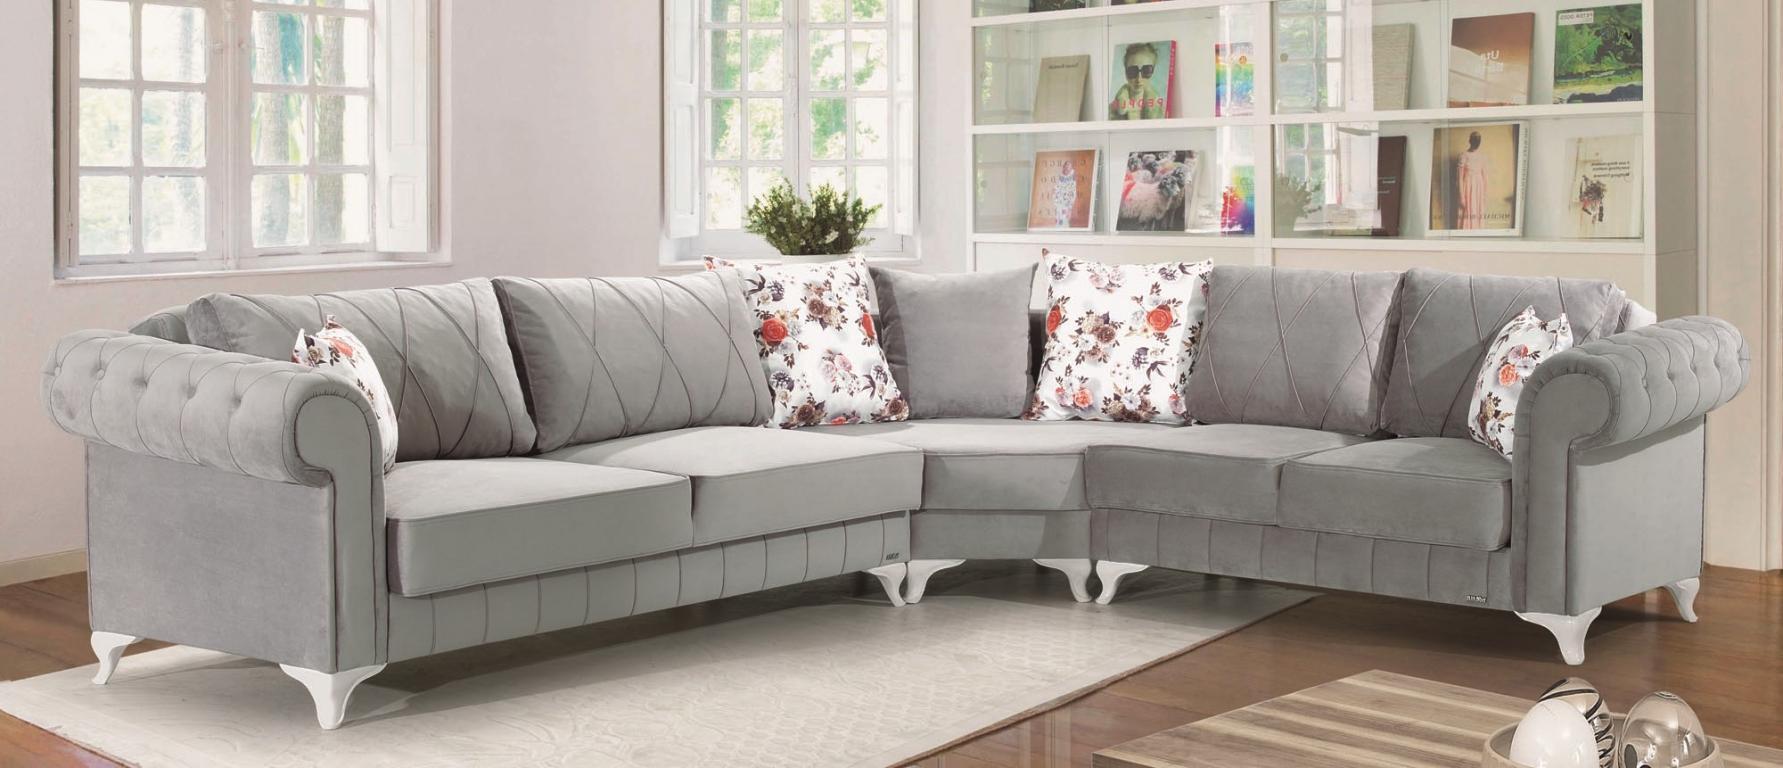 elegand sitzecke 3 l 2 yuvam m belhaus in wuppertal cilek offizieller h ndler in europa. Black Bedroom Furniture Sets. Home Design Ideas